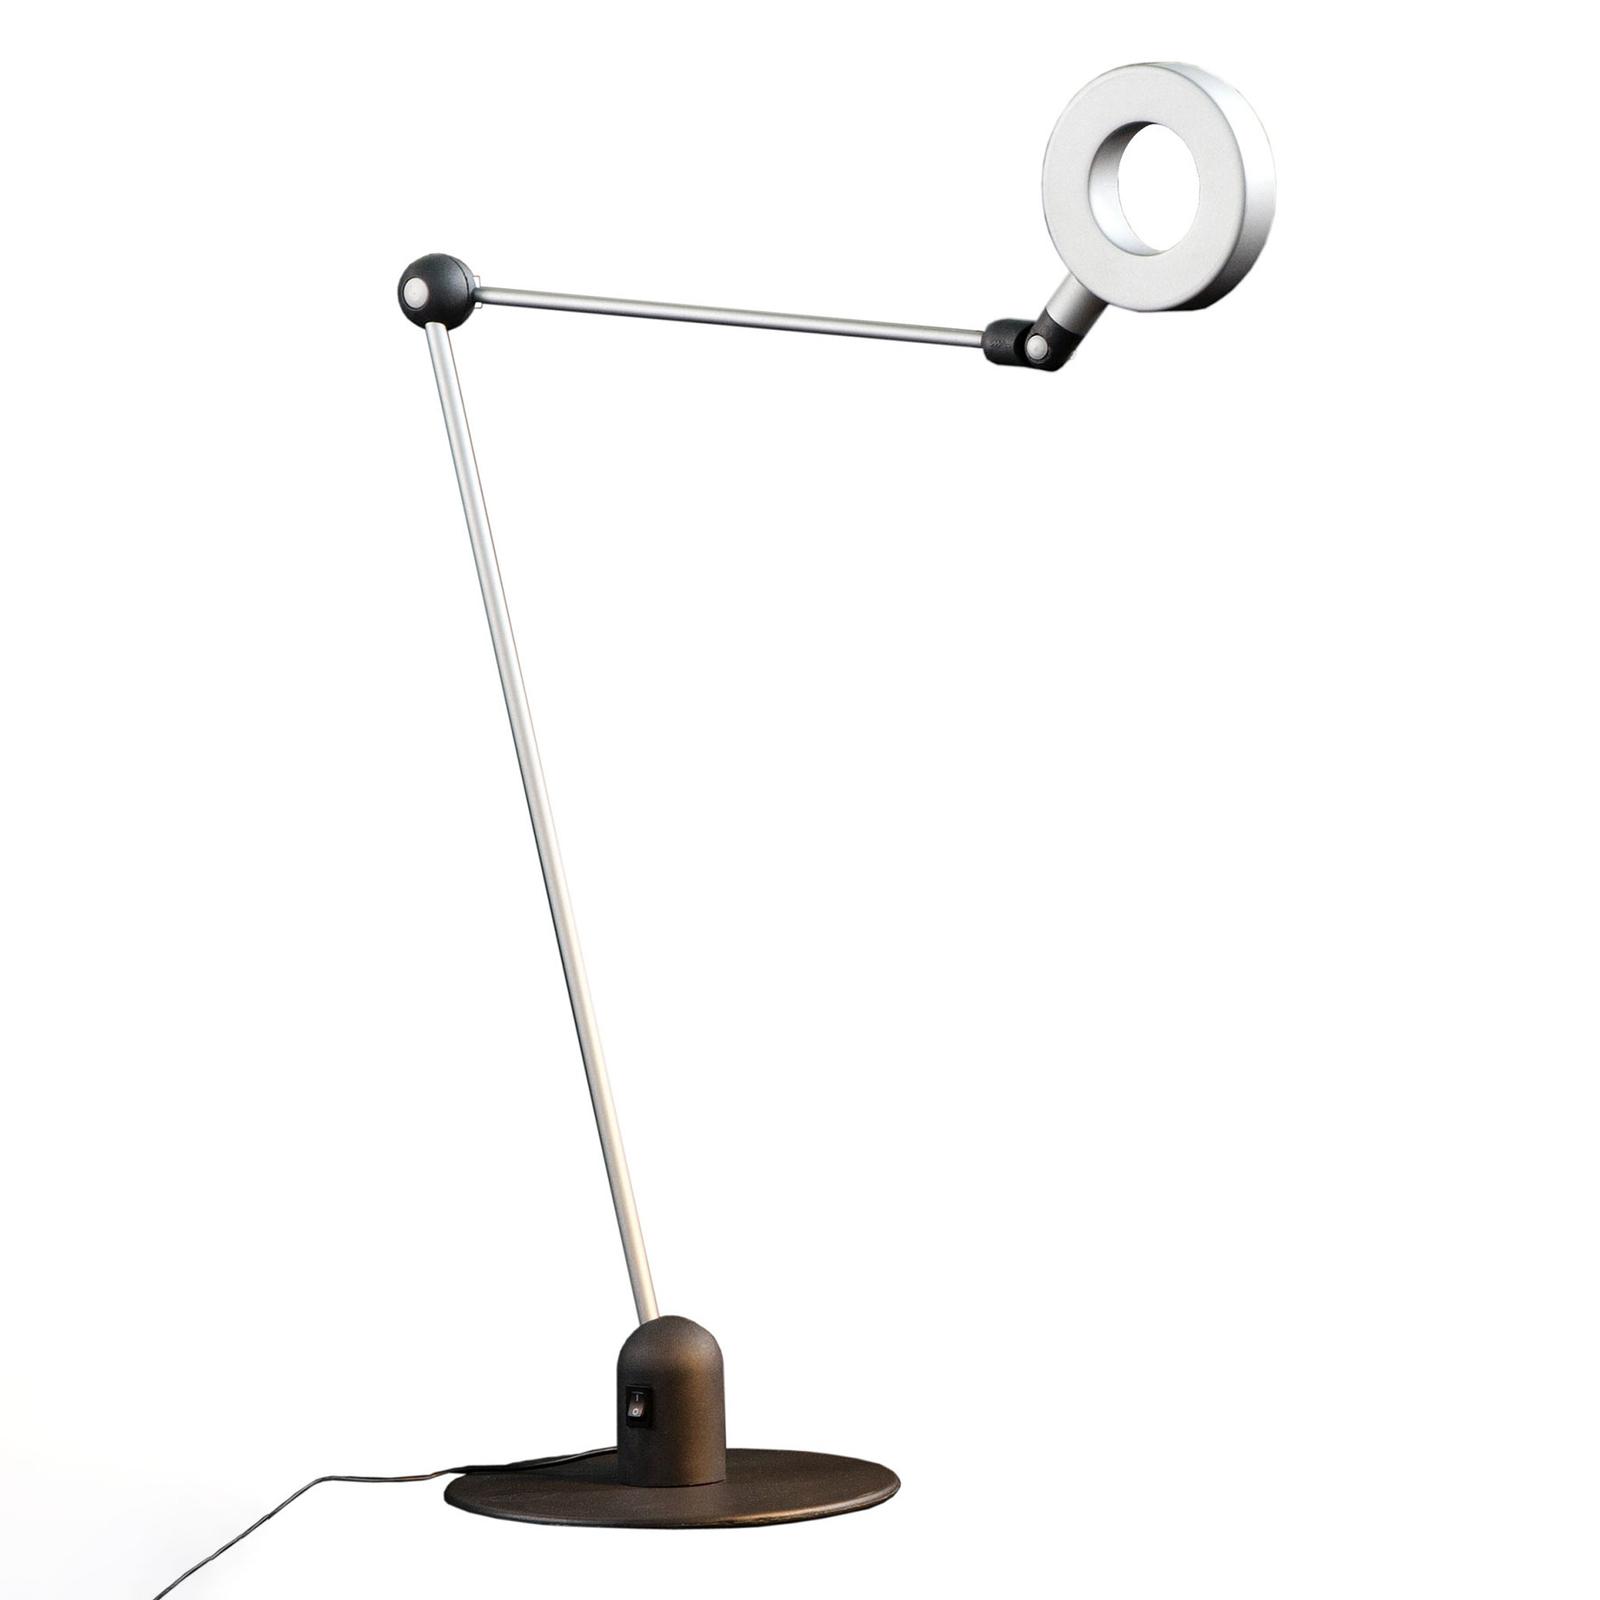 Martinelli Luce L'amica -LED-pöytävalaisin, harmaa